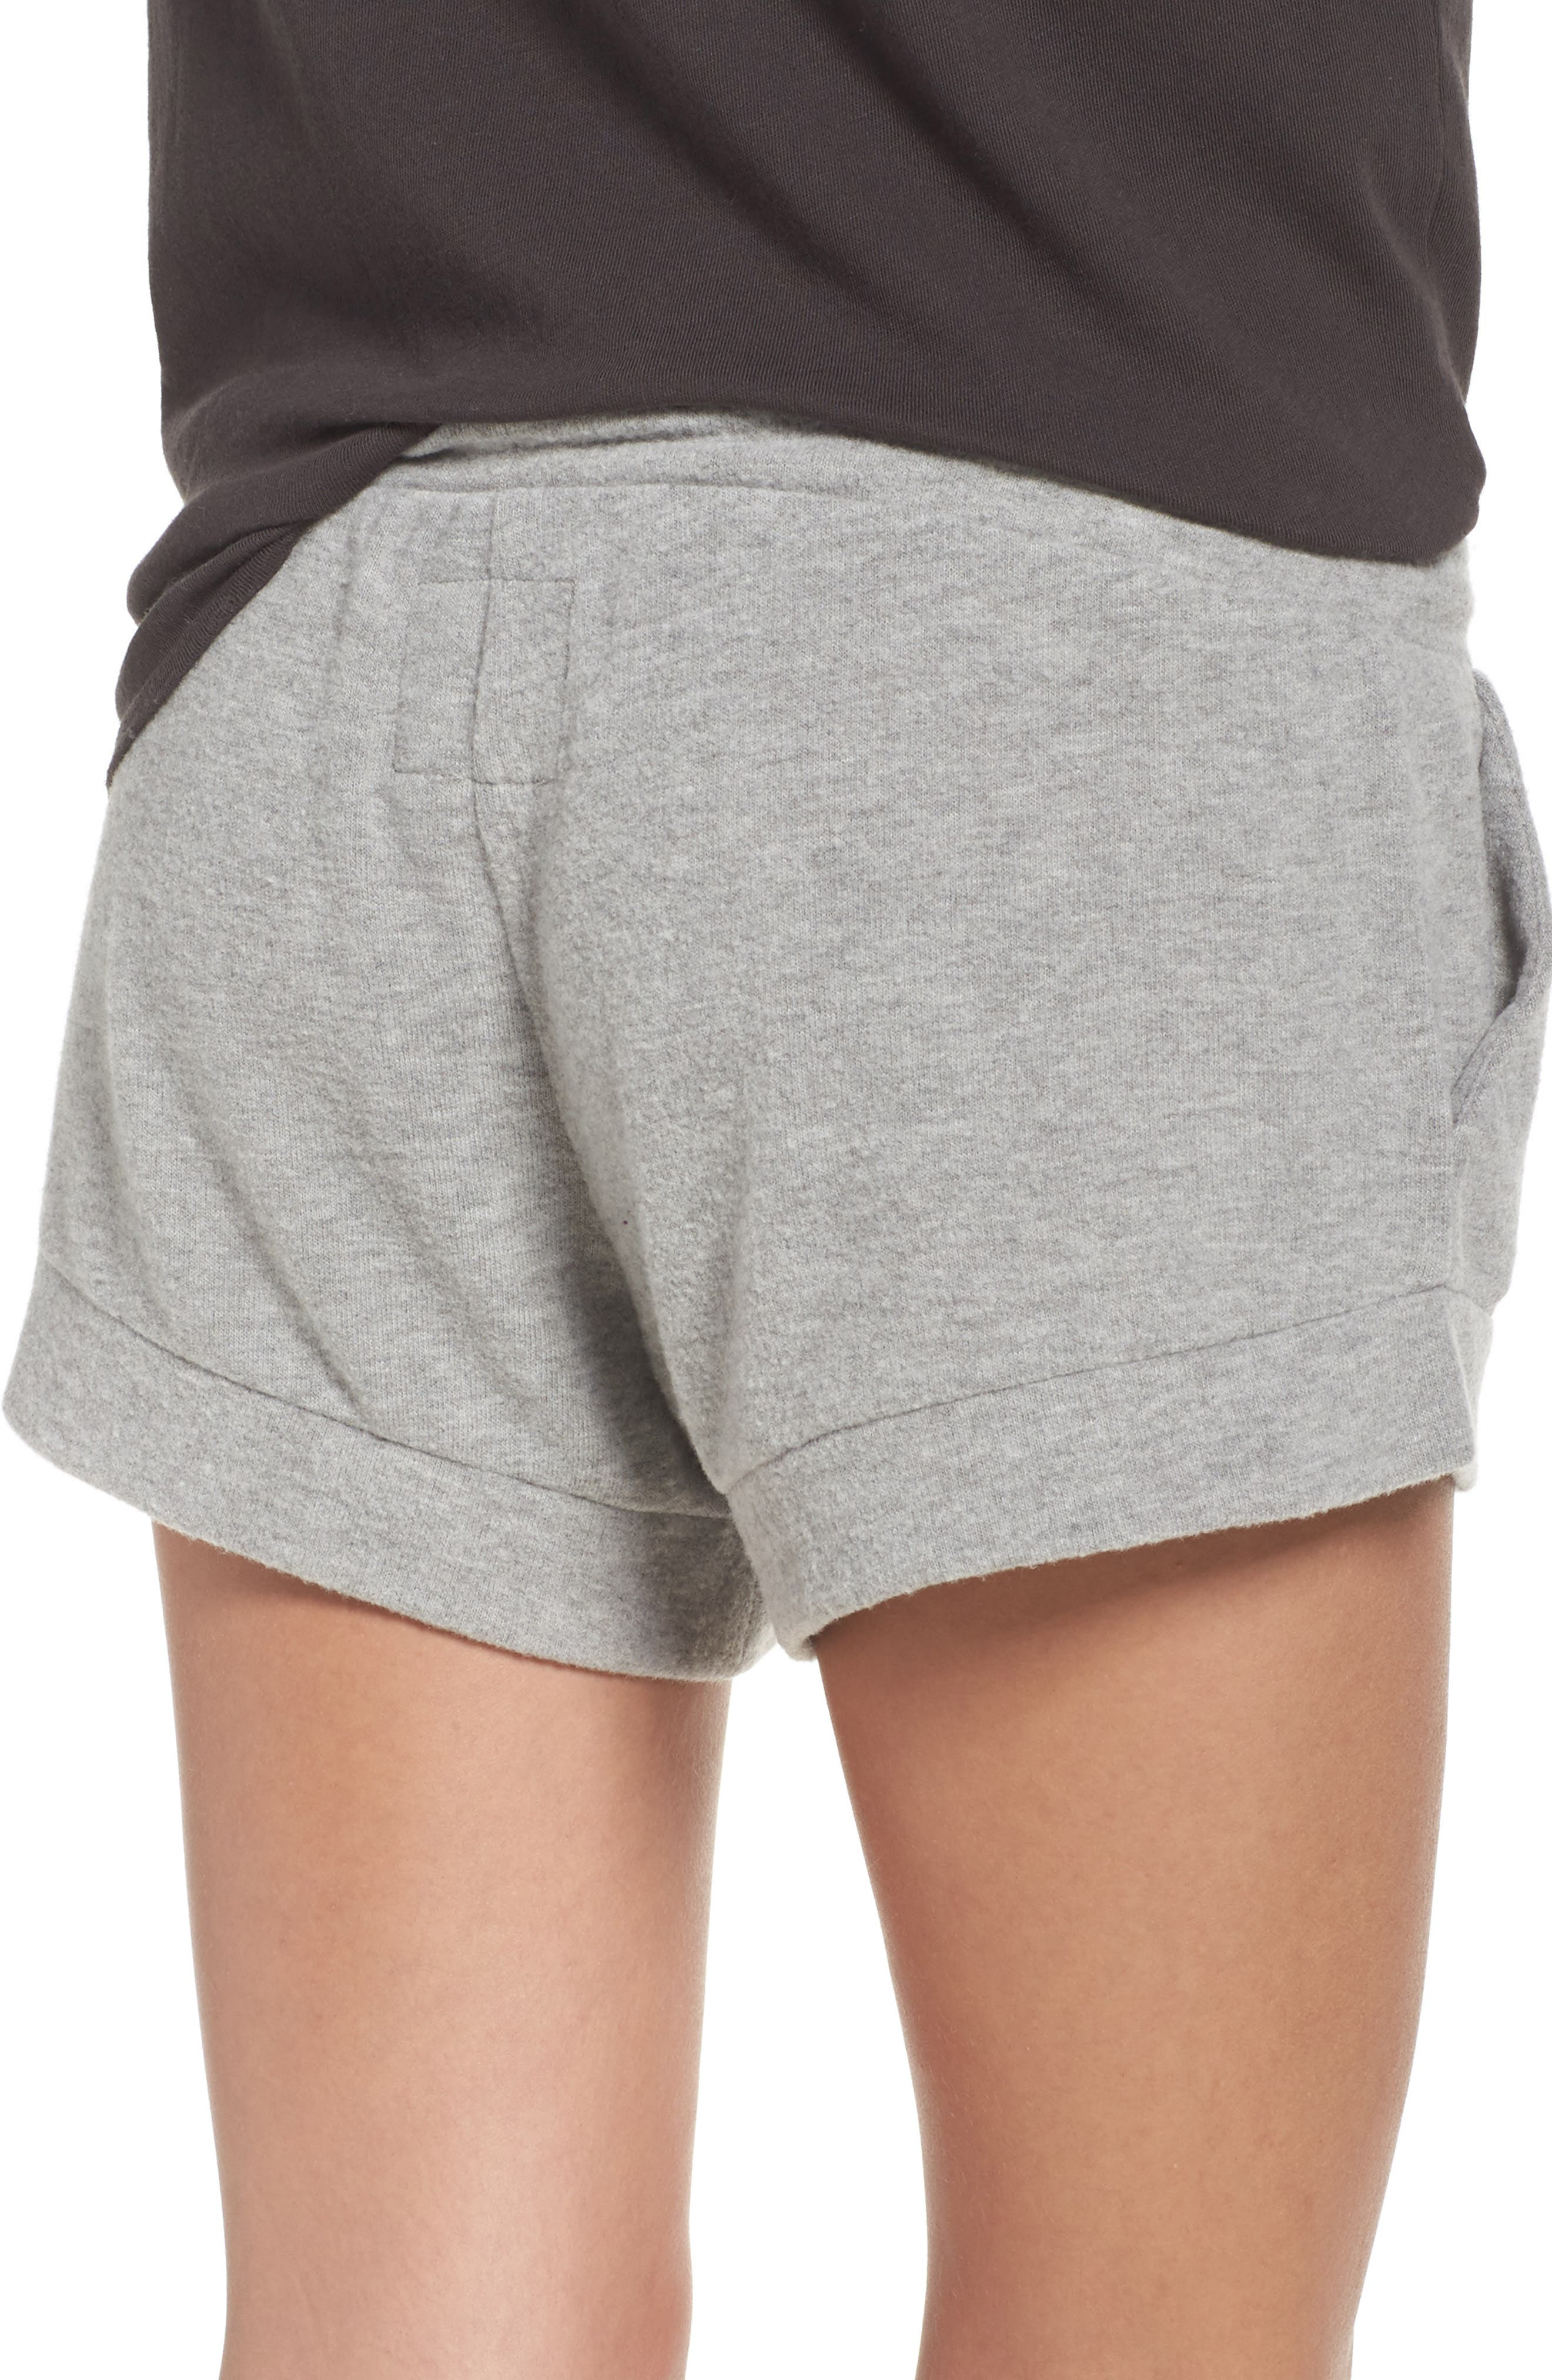 Lounge Shorts,                             Alternate thumbnail 2, color,                             039